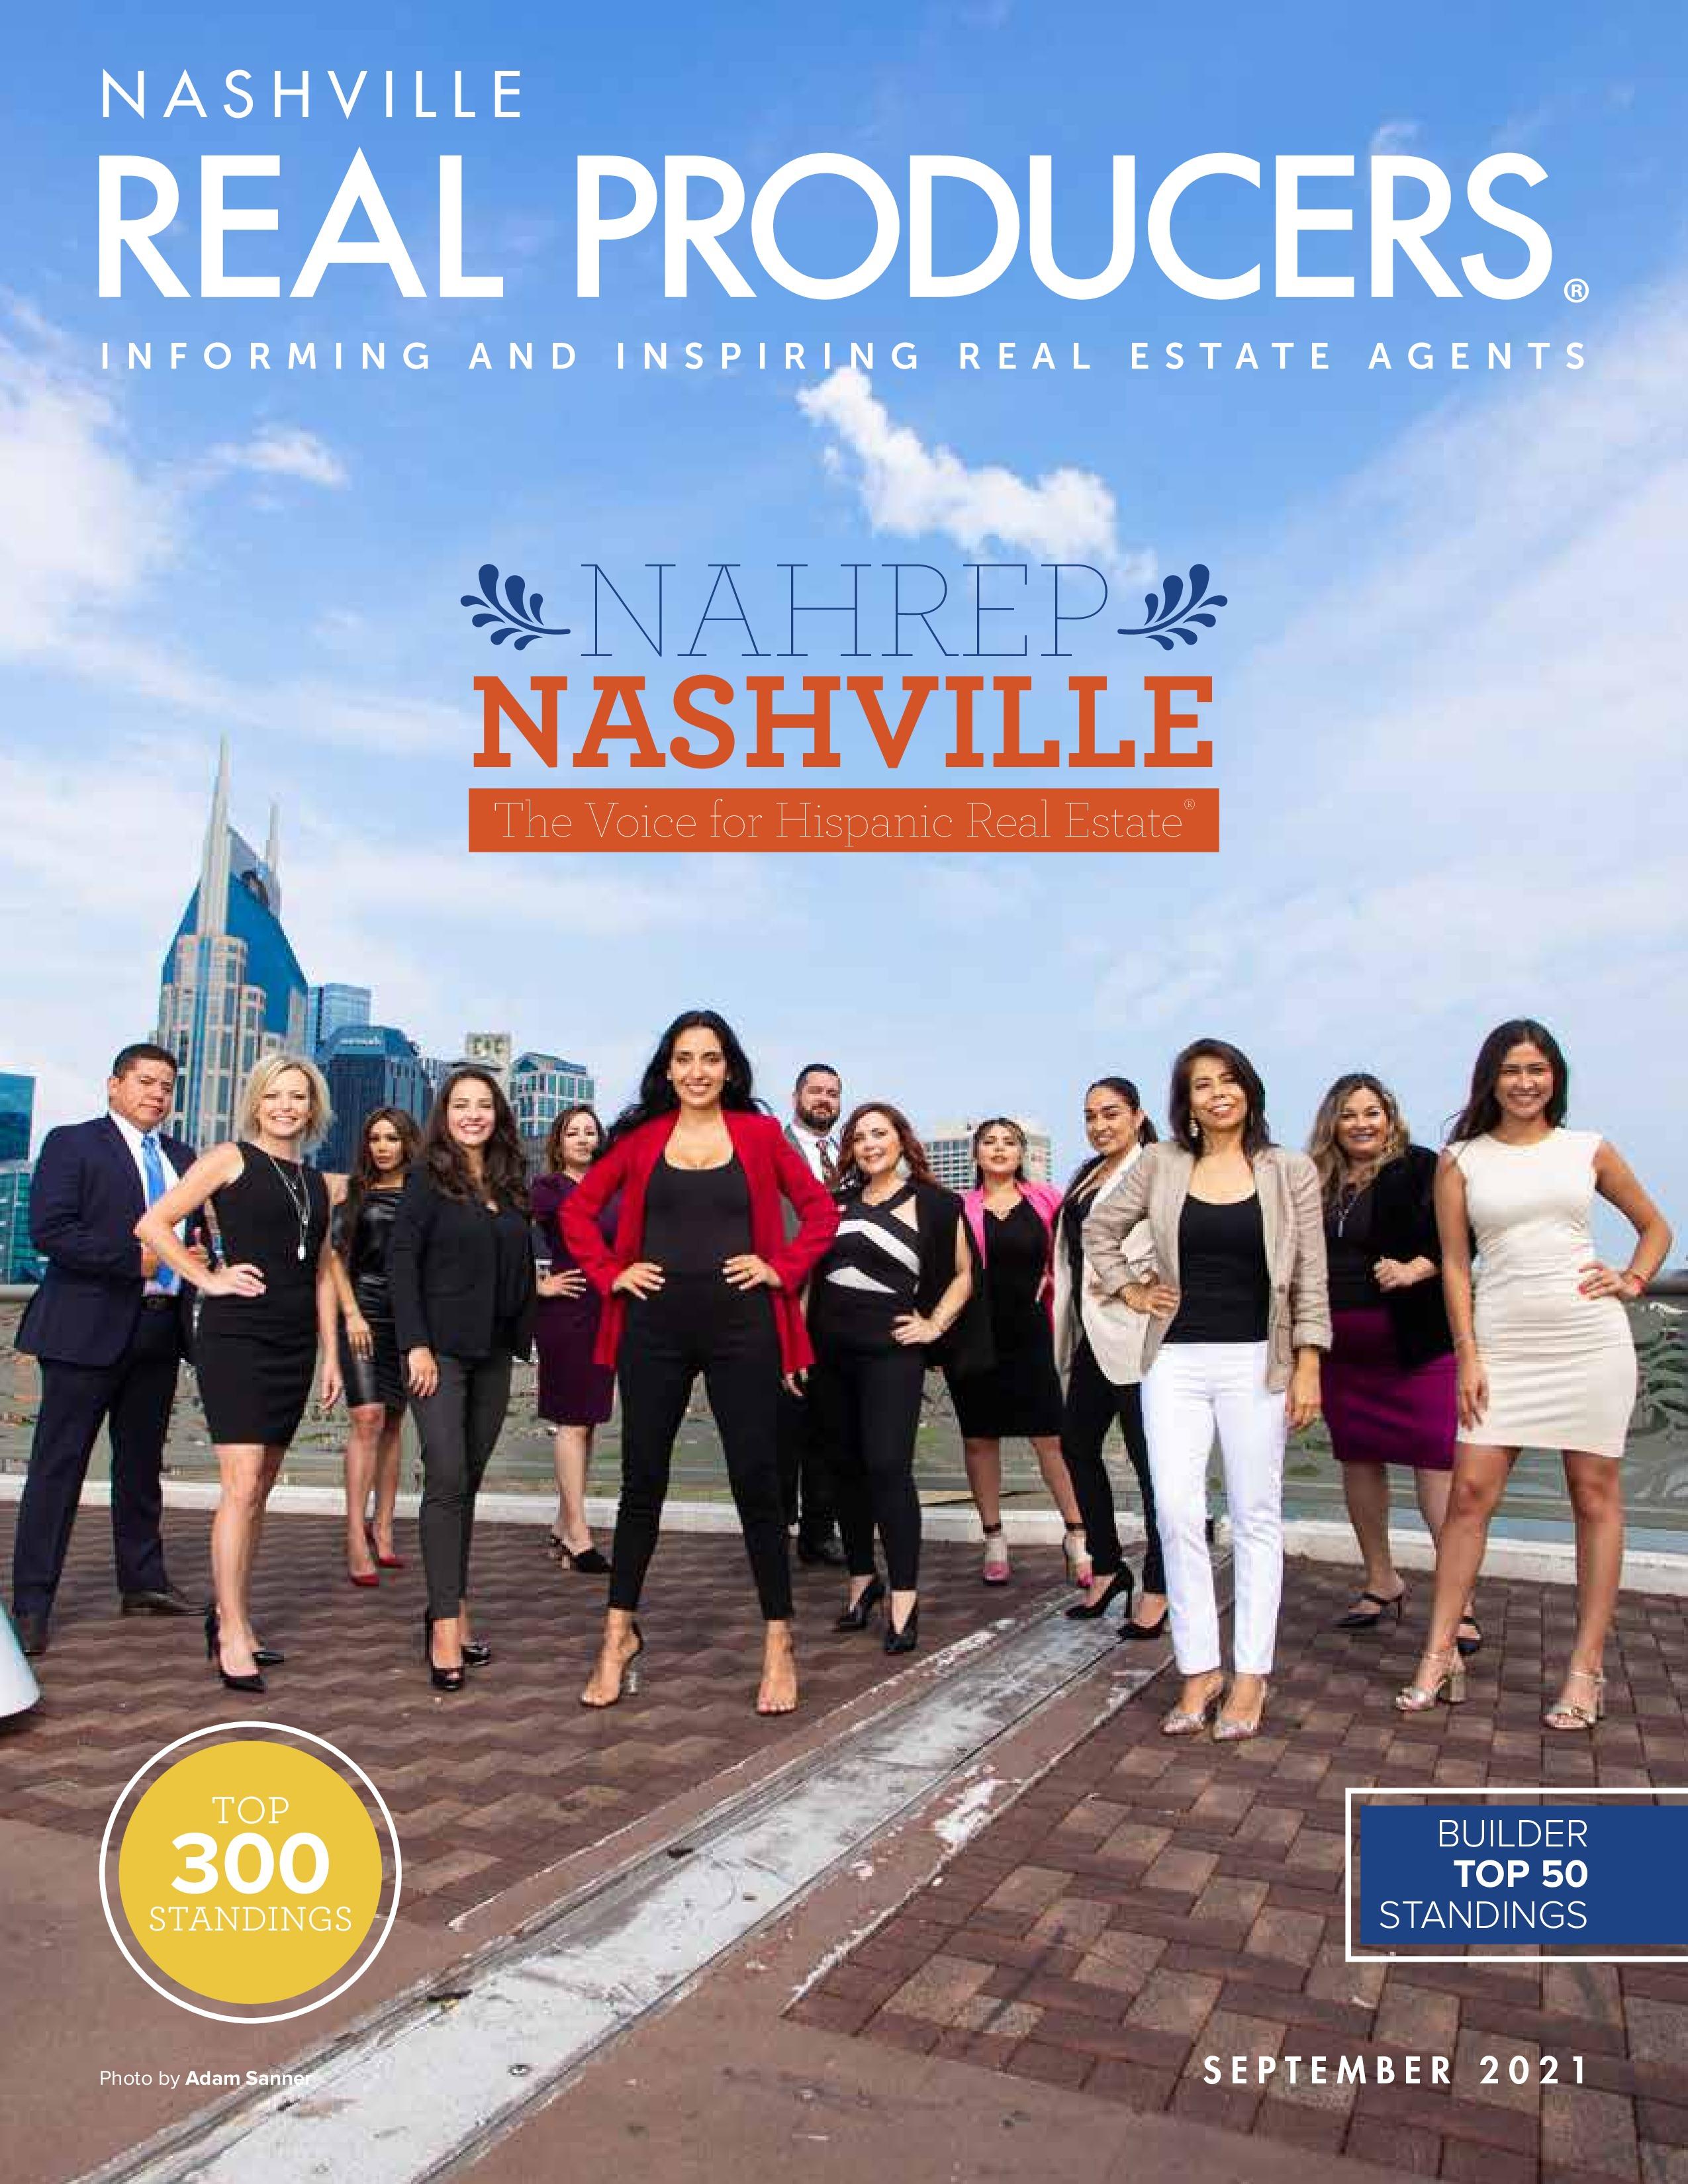 Nashville Real Producers 2021-09-01